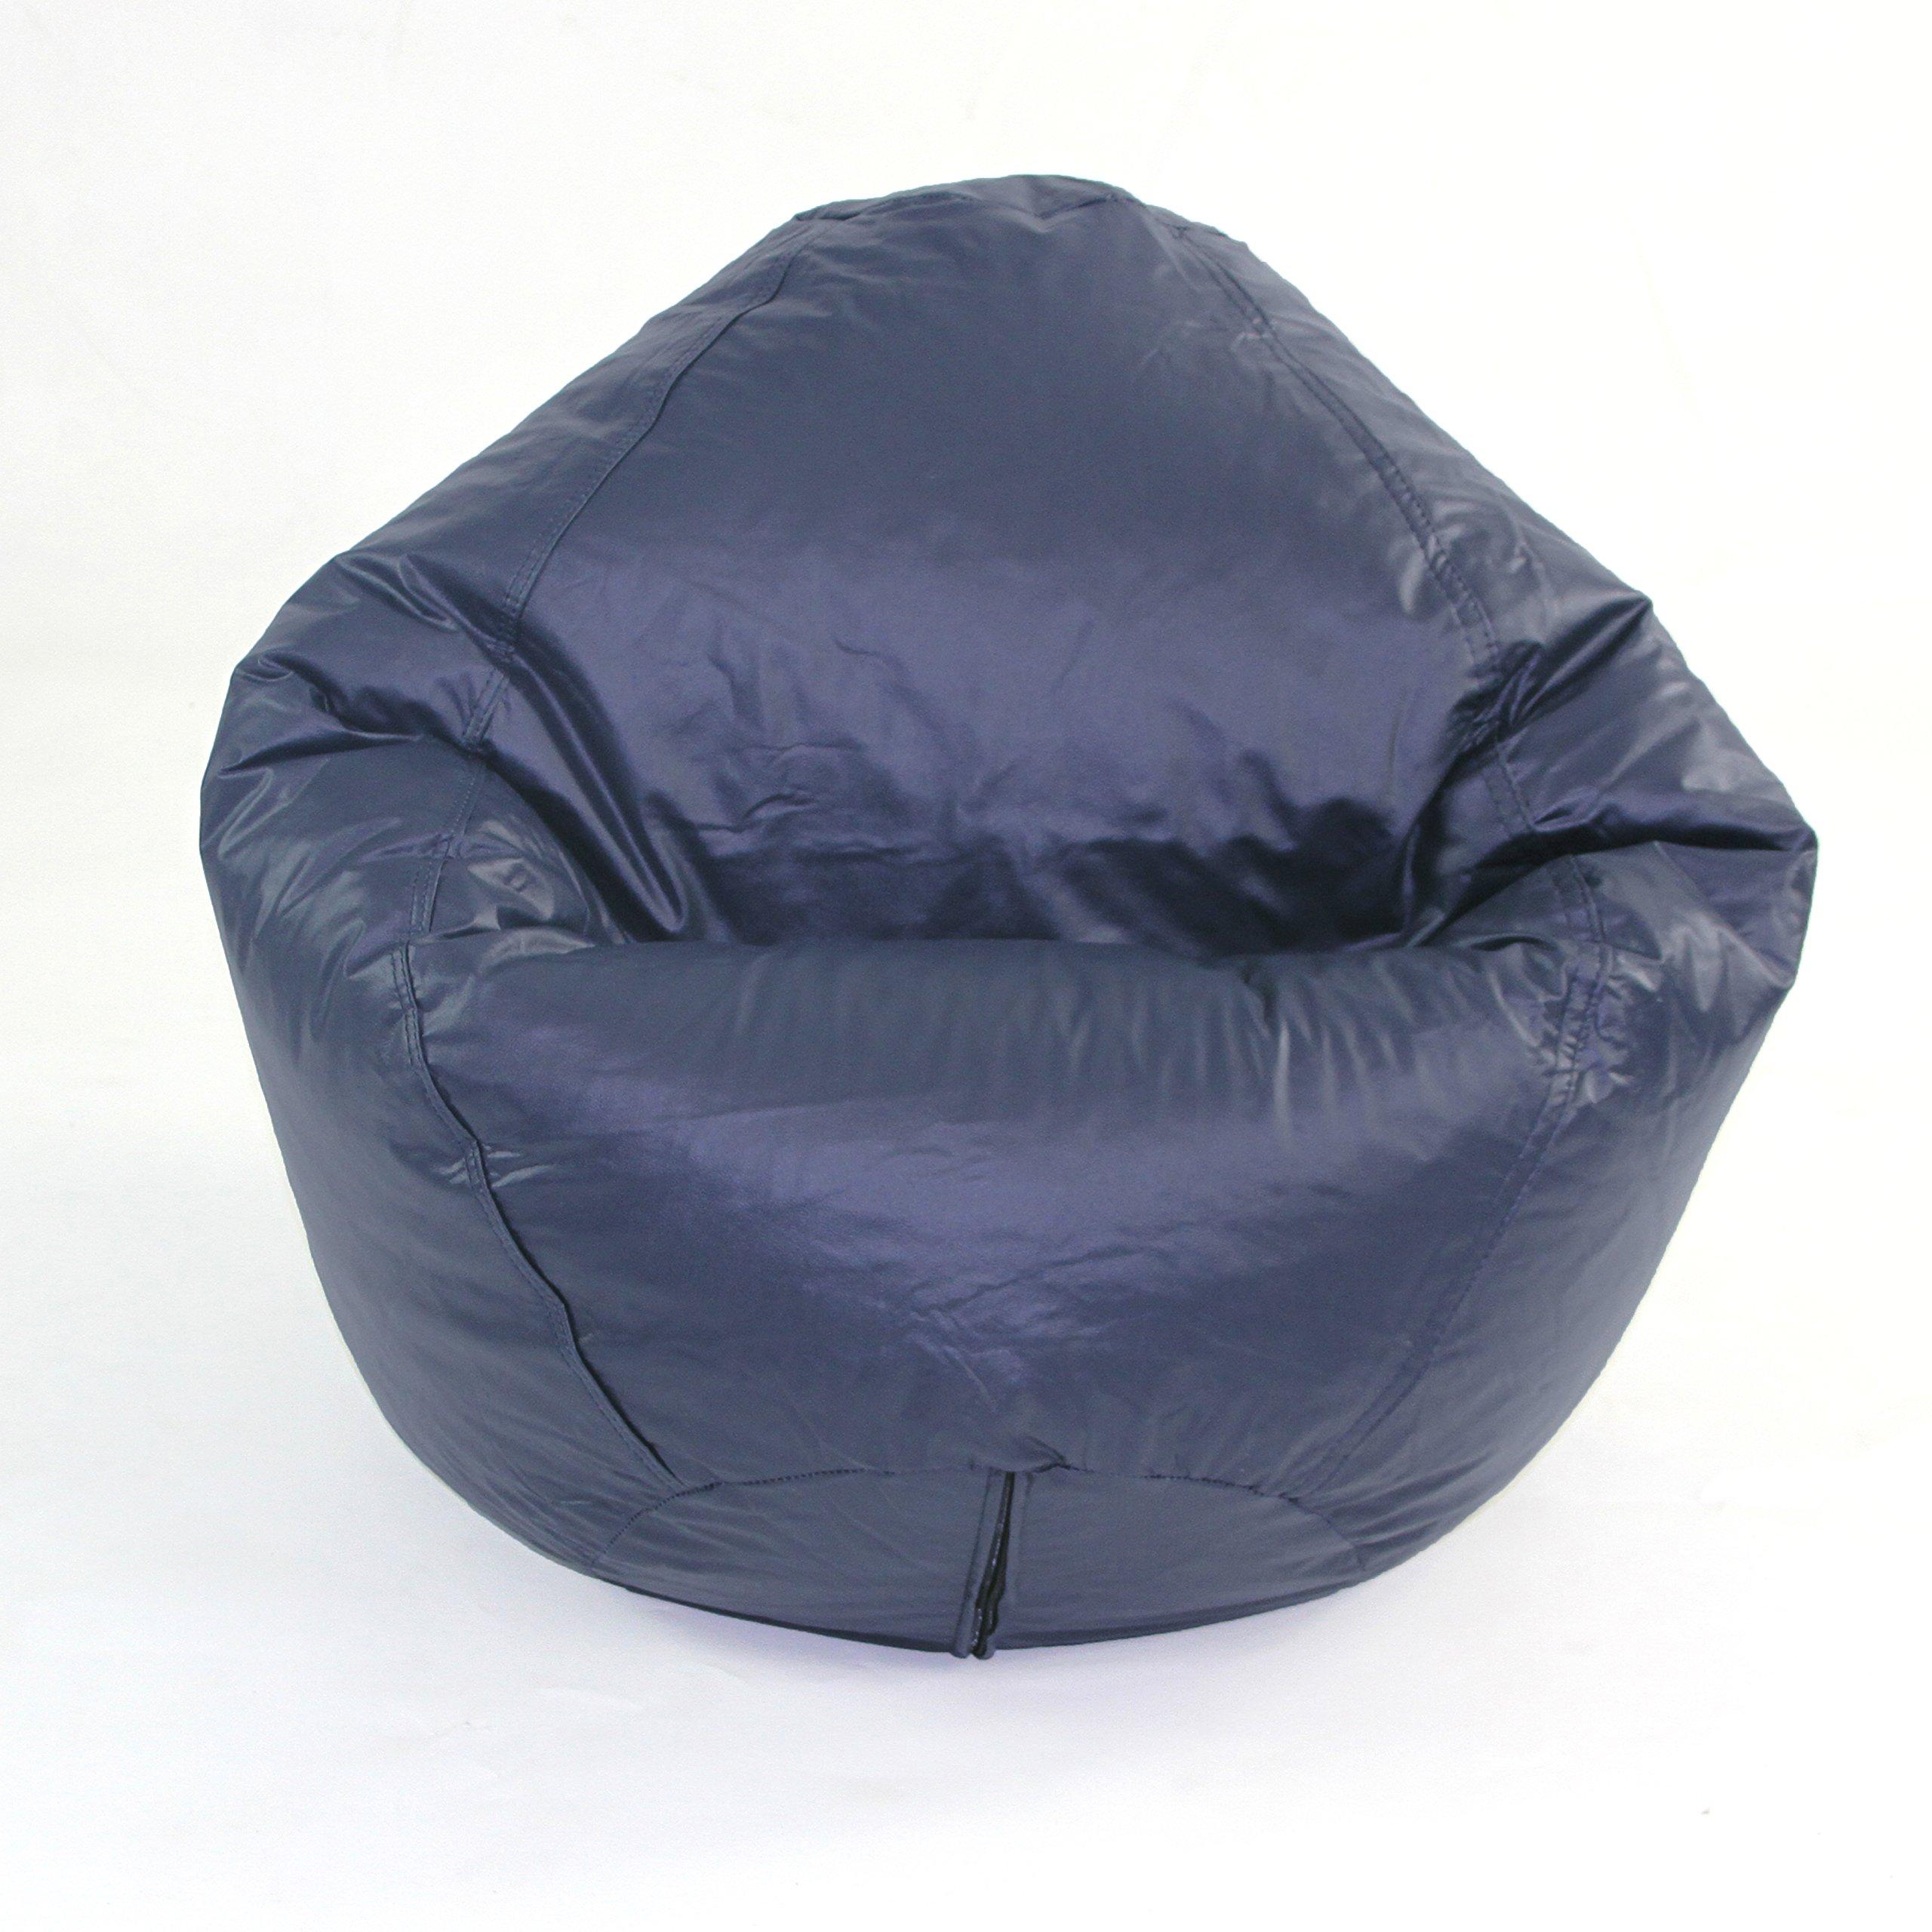 American Furniture Alliance Fun Factory Classic Bean Bag, Medium, Navy